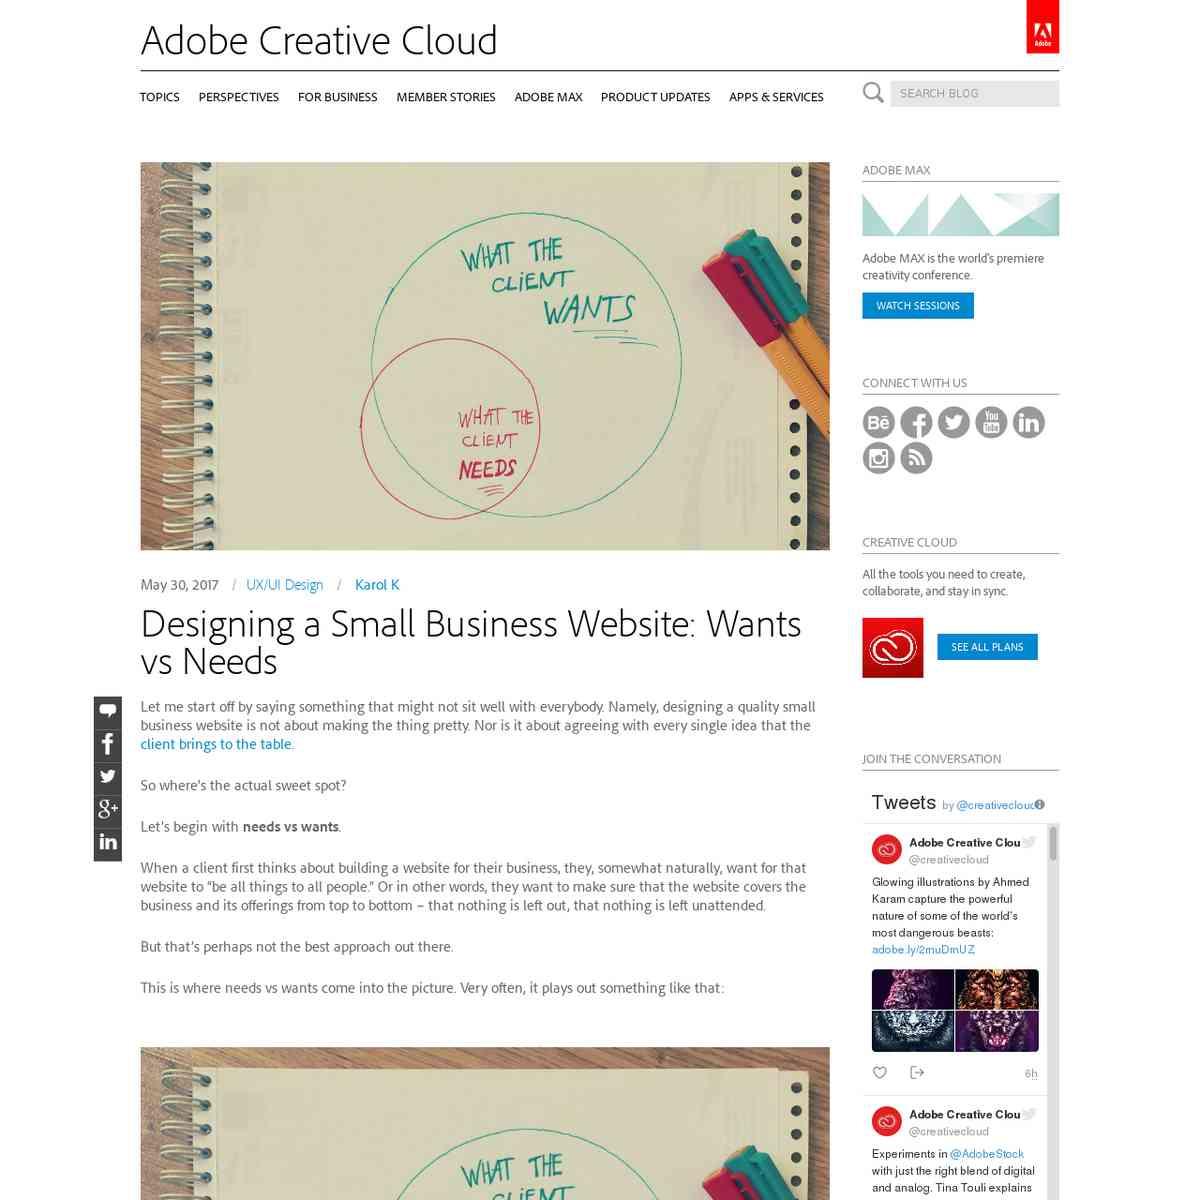 blogs.adobe.com/creativecloud/designing-a-small-business-website-wants-vs-needs/